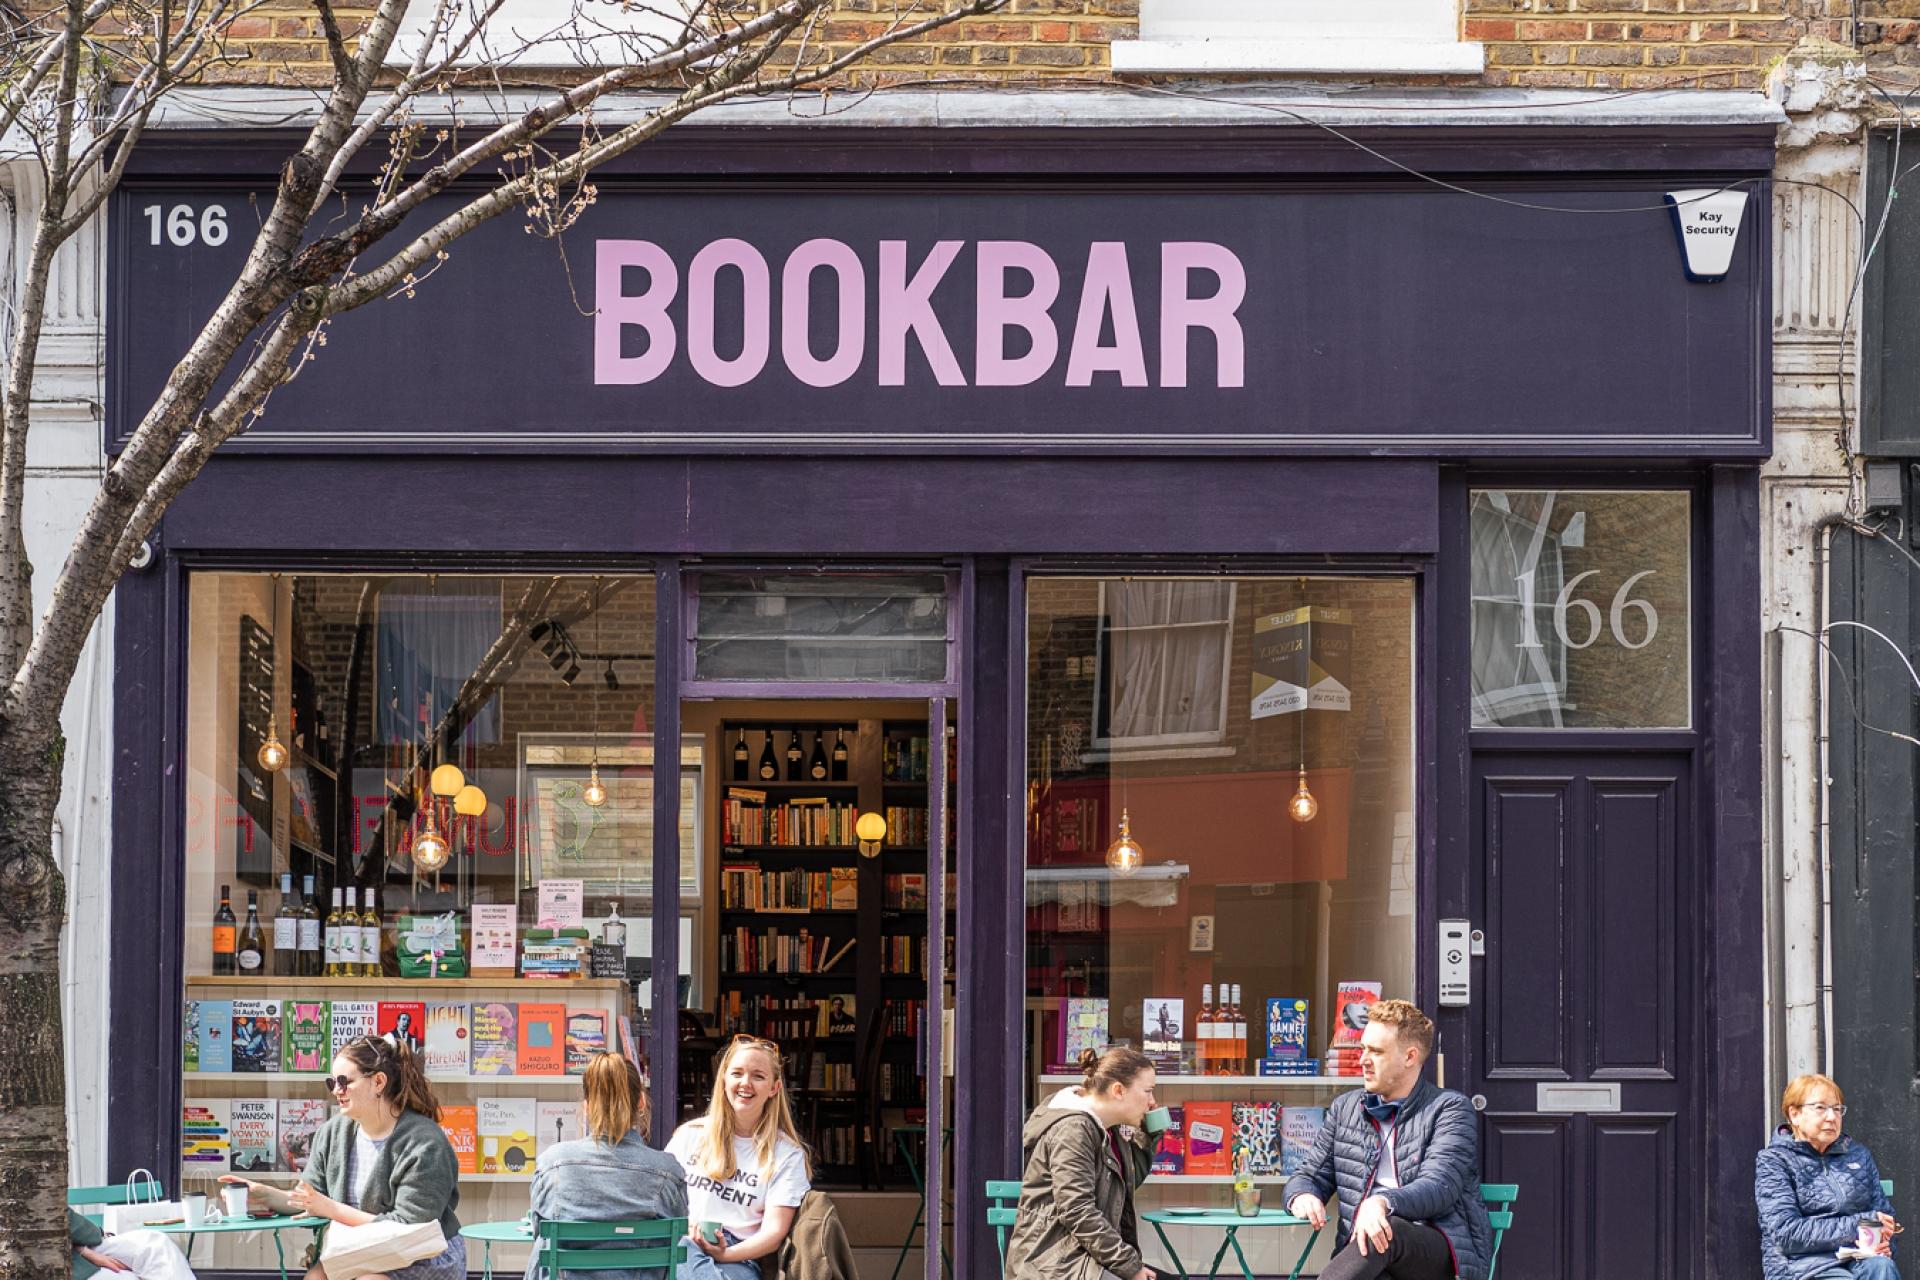 LoveReading Bookshop Feature: BookBar (London)